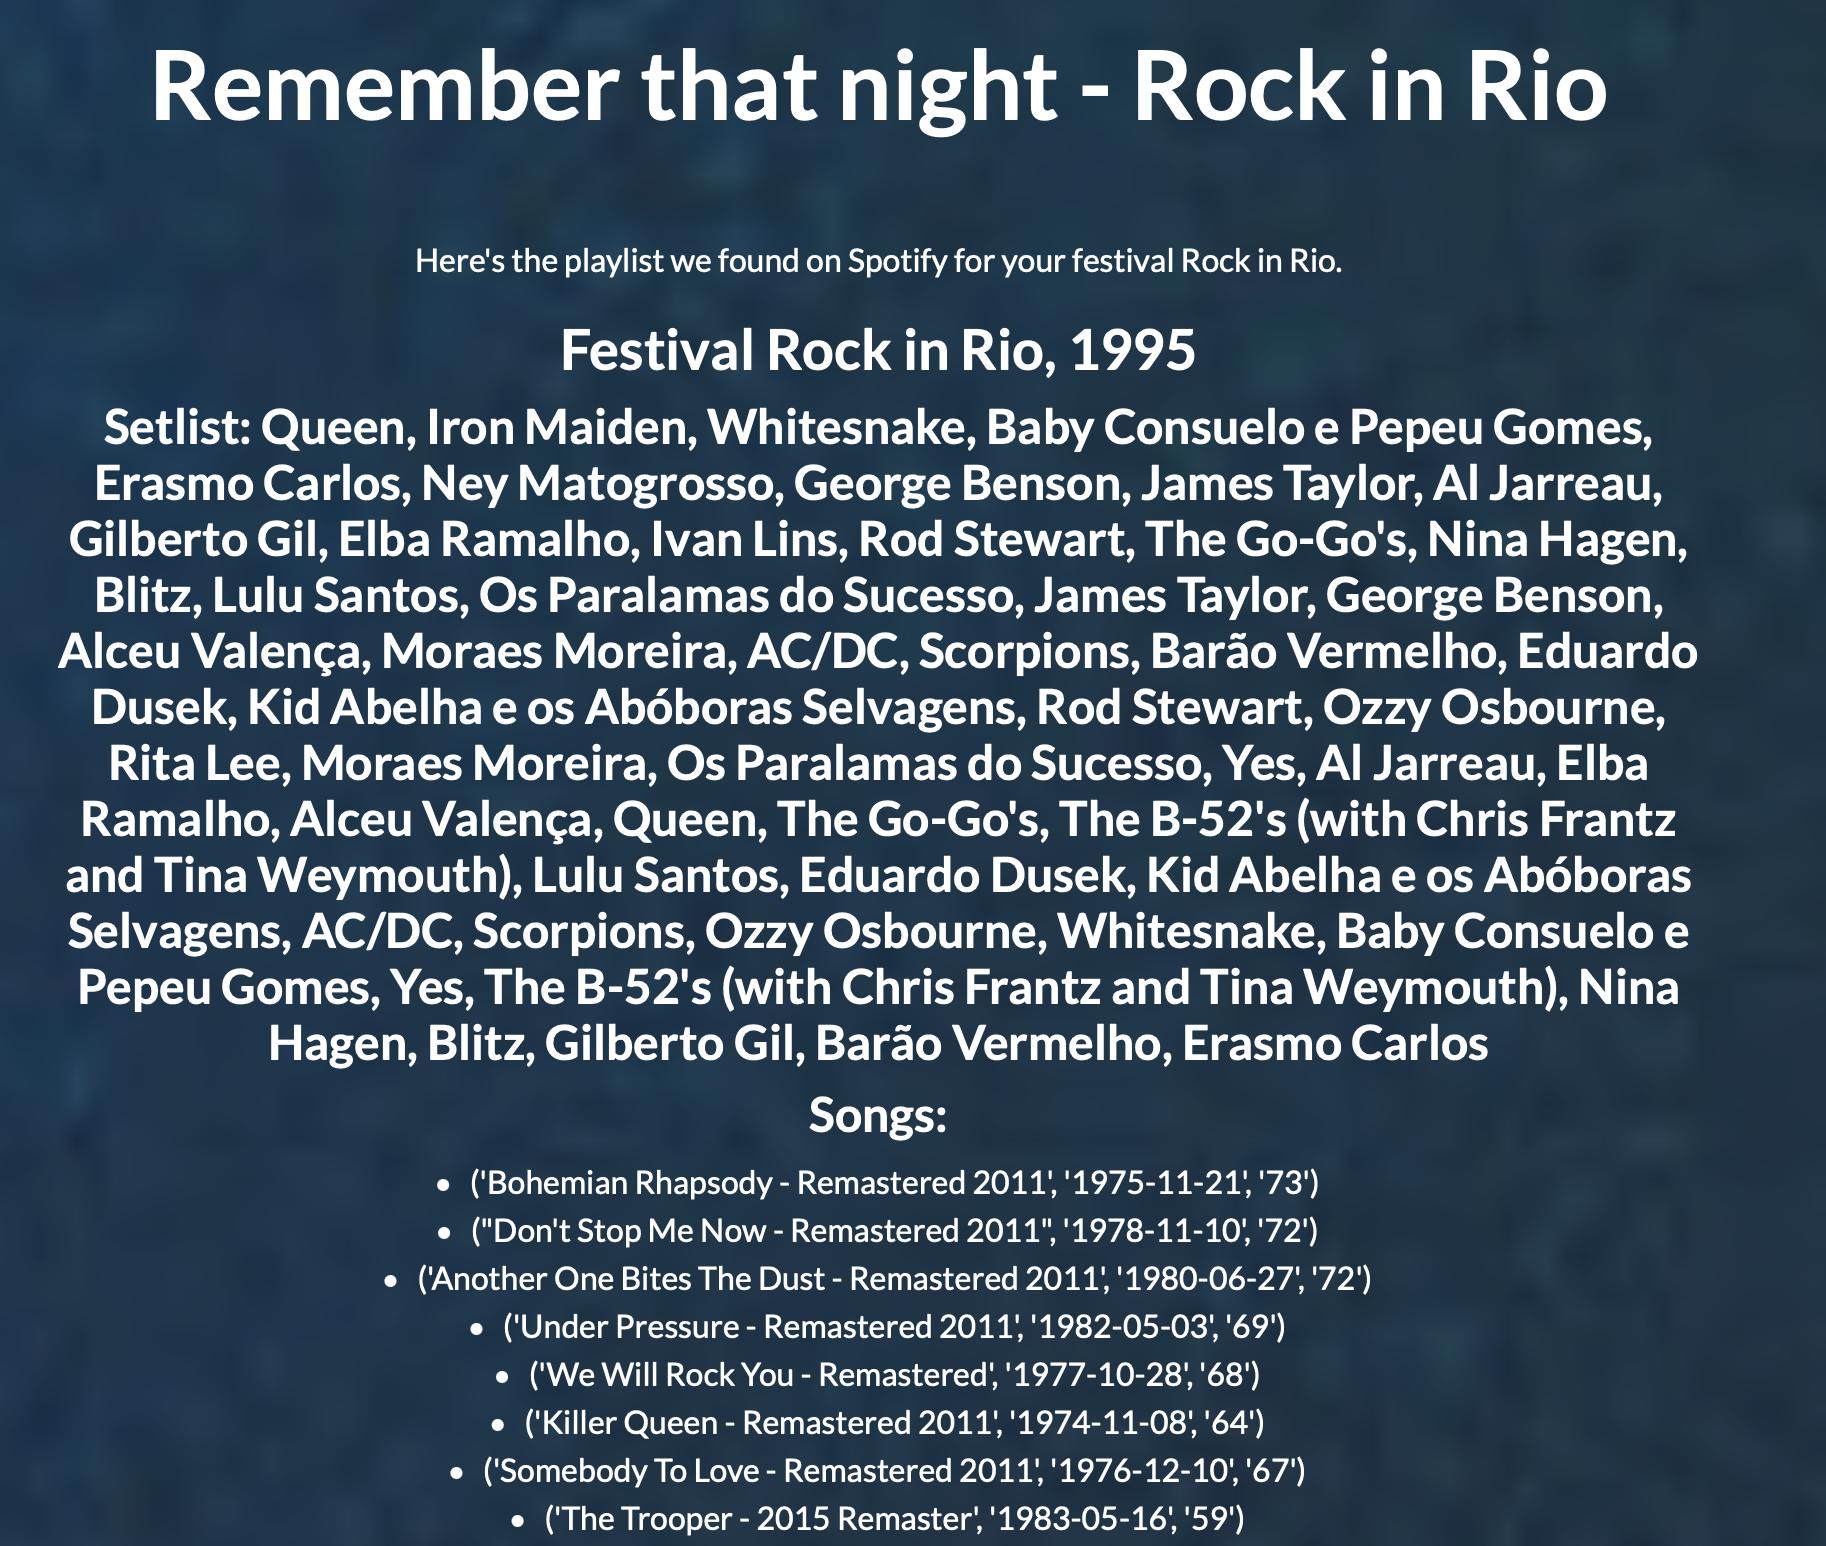 Screenshots of Remember that night webapp